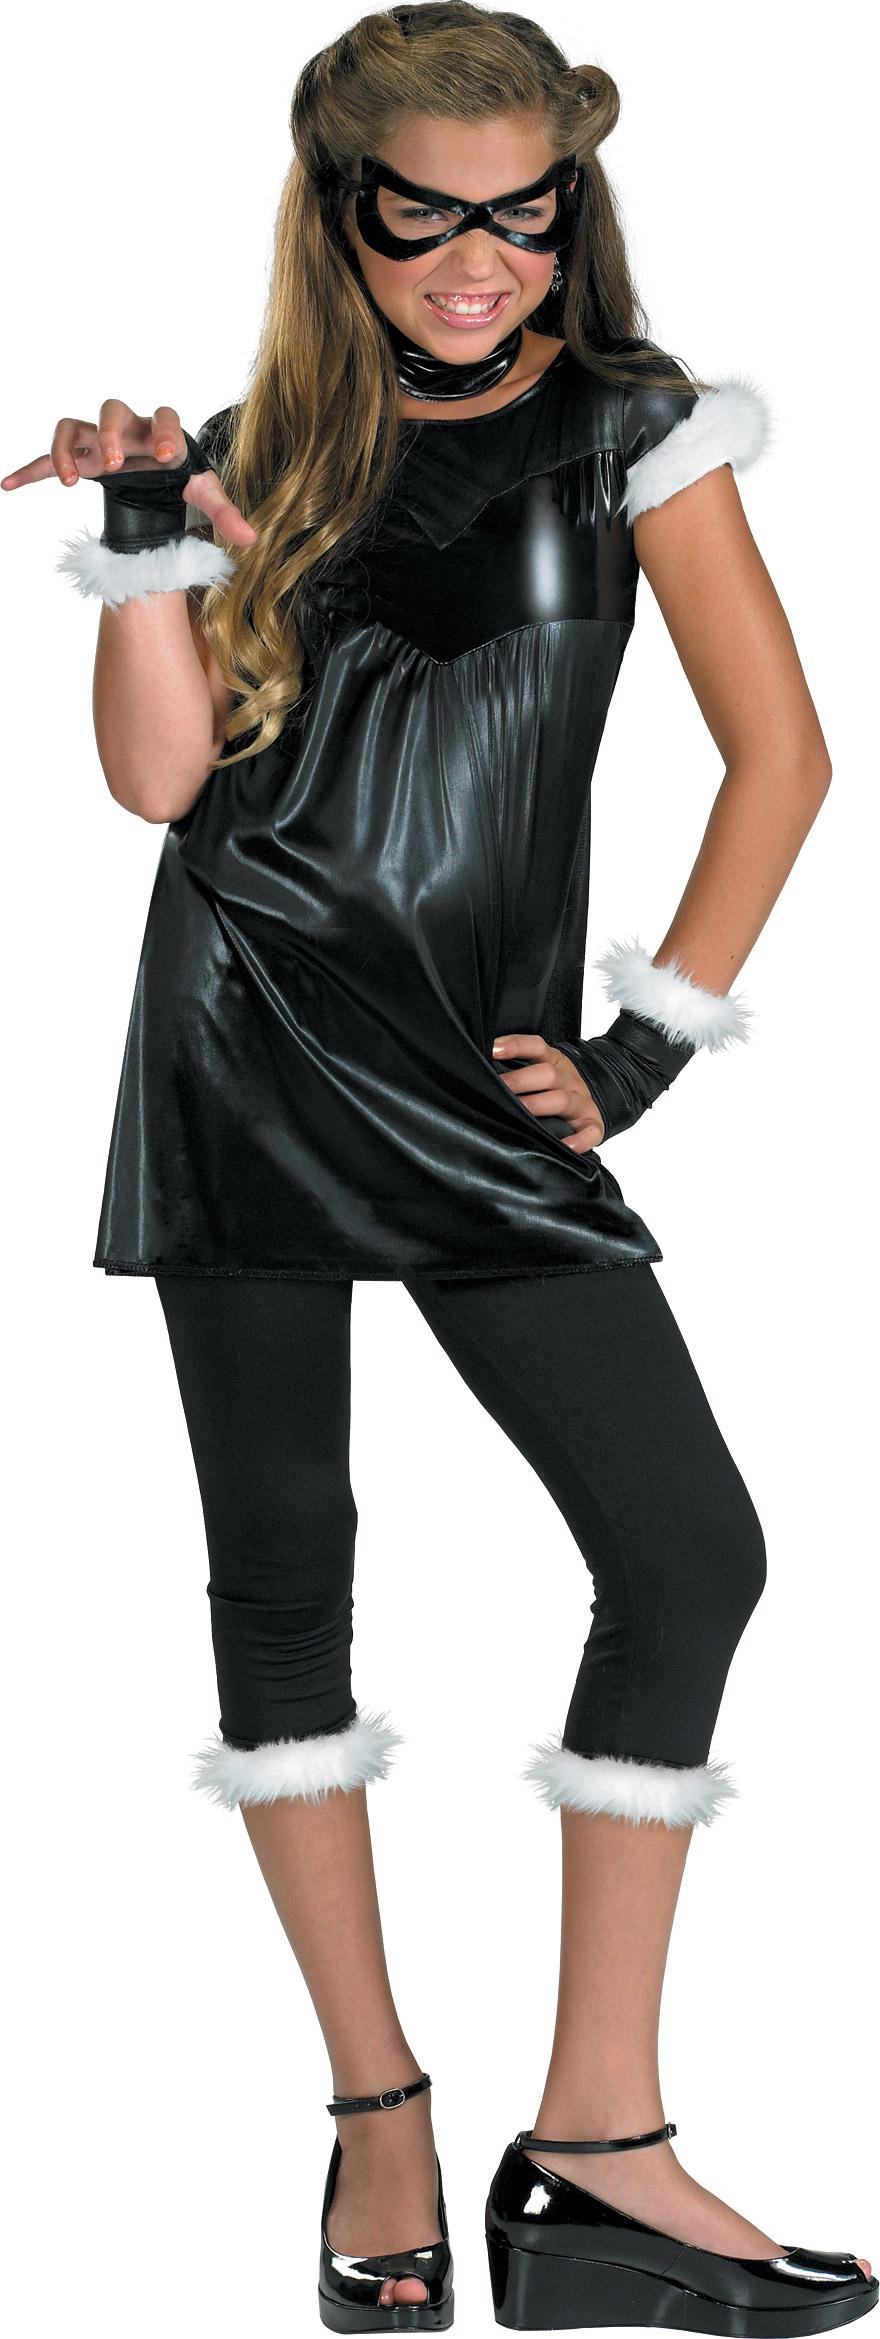 The Amazing Spider-man - Black Cat Girl Pre-Teen / Teen Costume.